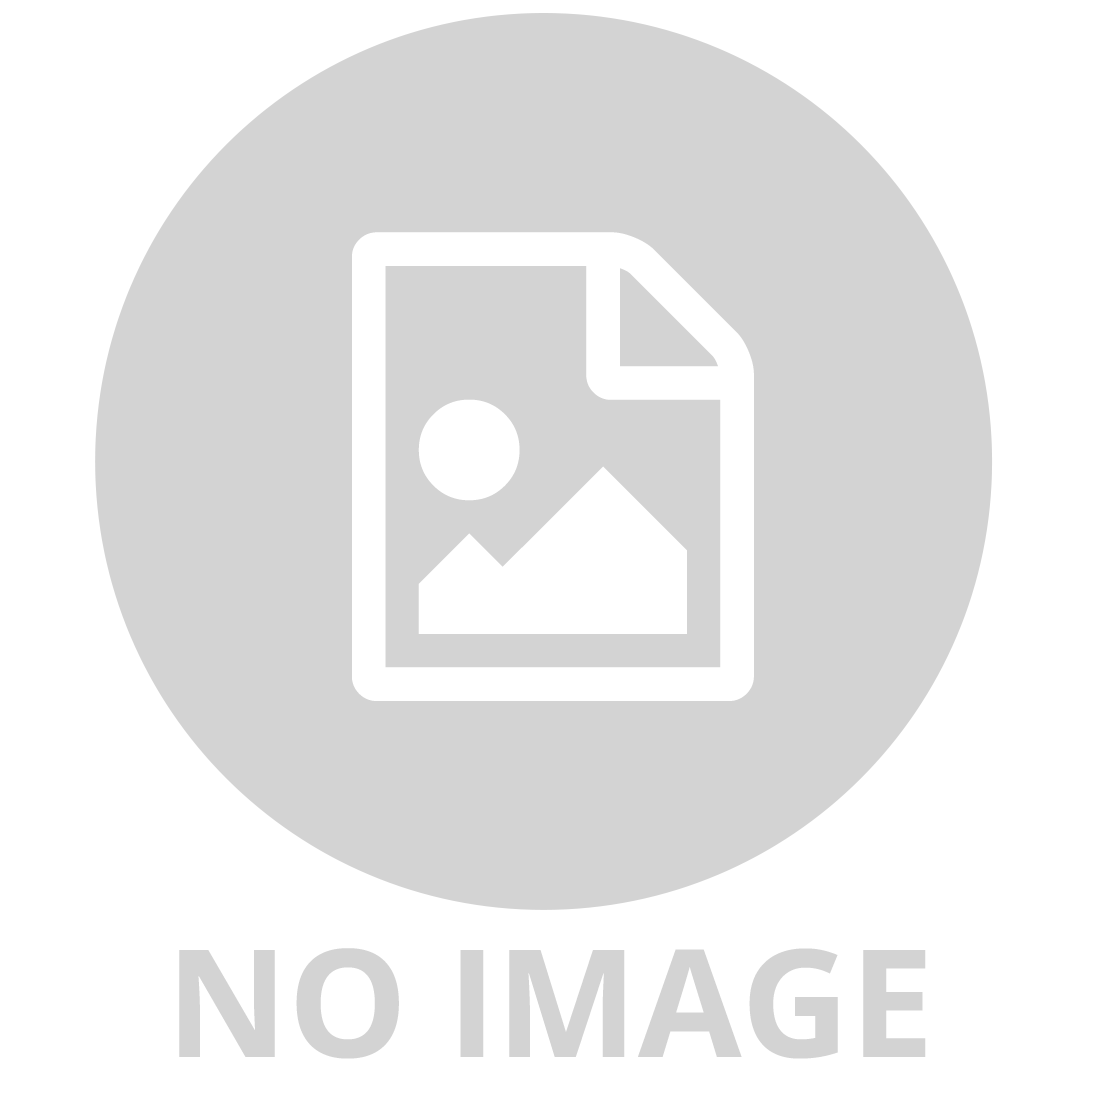 20CM METALLIC GRIPPY BALL